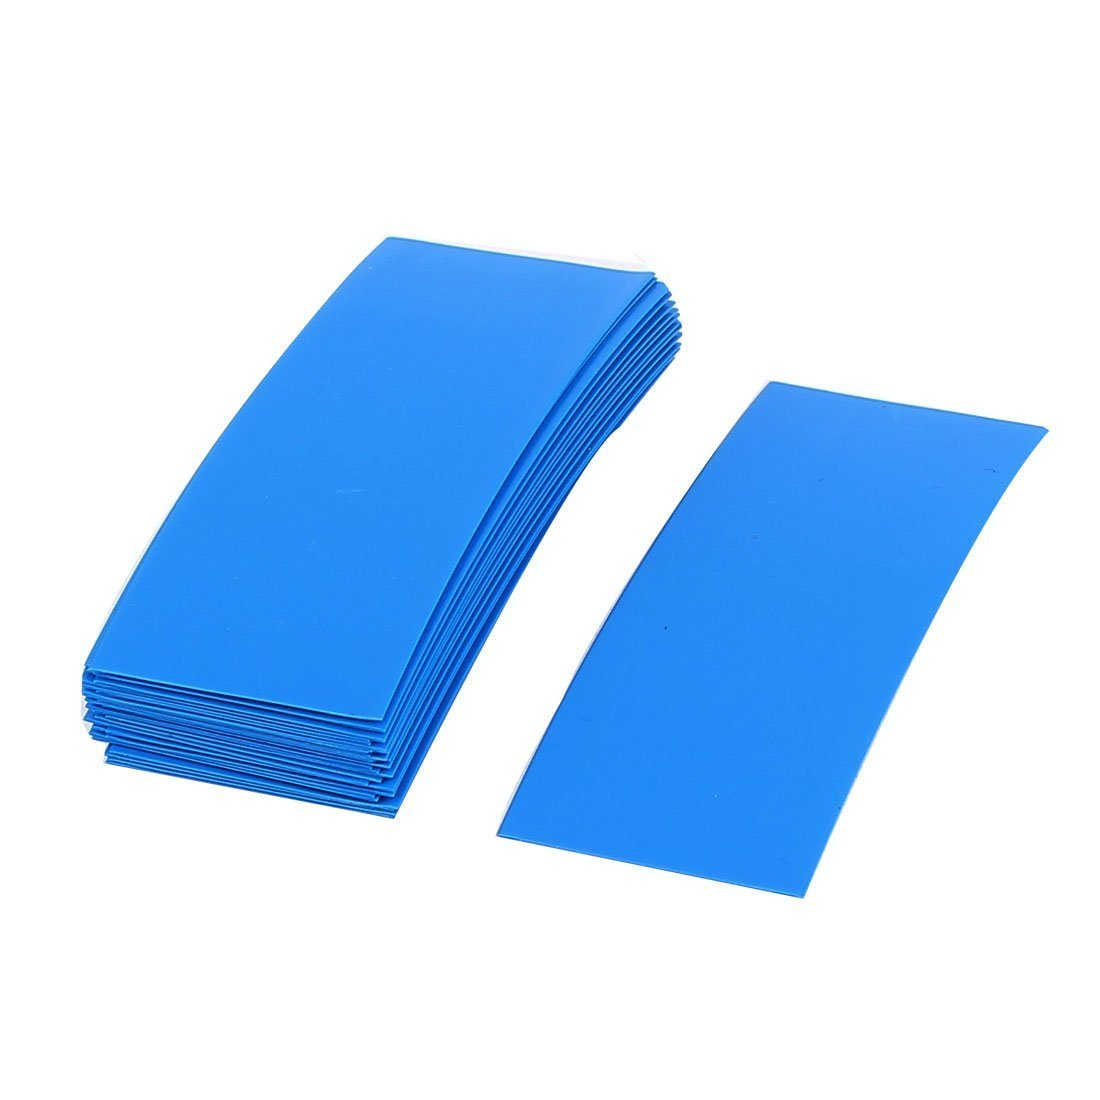 sourcingmap 30pcs 72mm x 18.5mm PVC Heat Shrink Tubing Blue for 1 x 18650 Battery a16012500ux1010